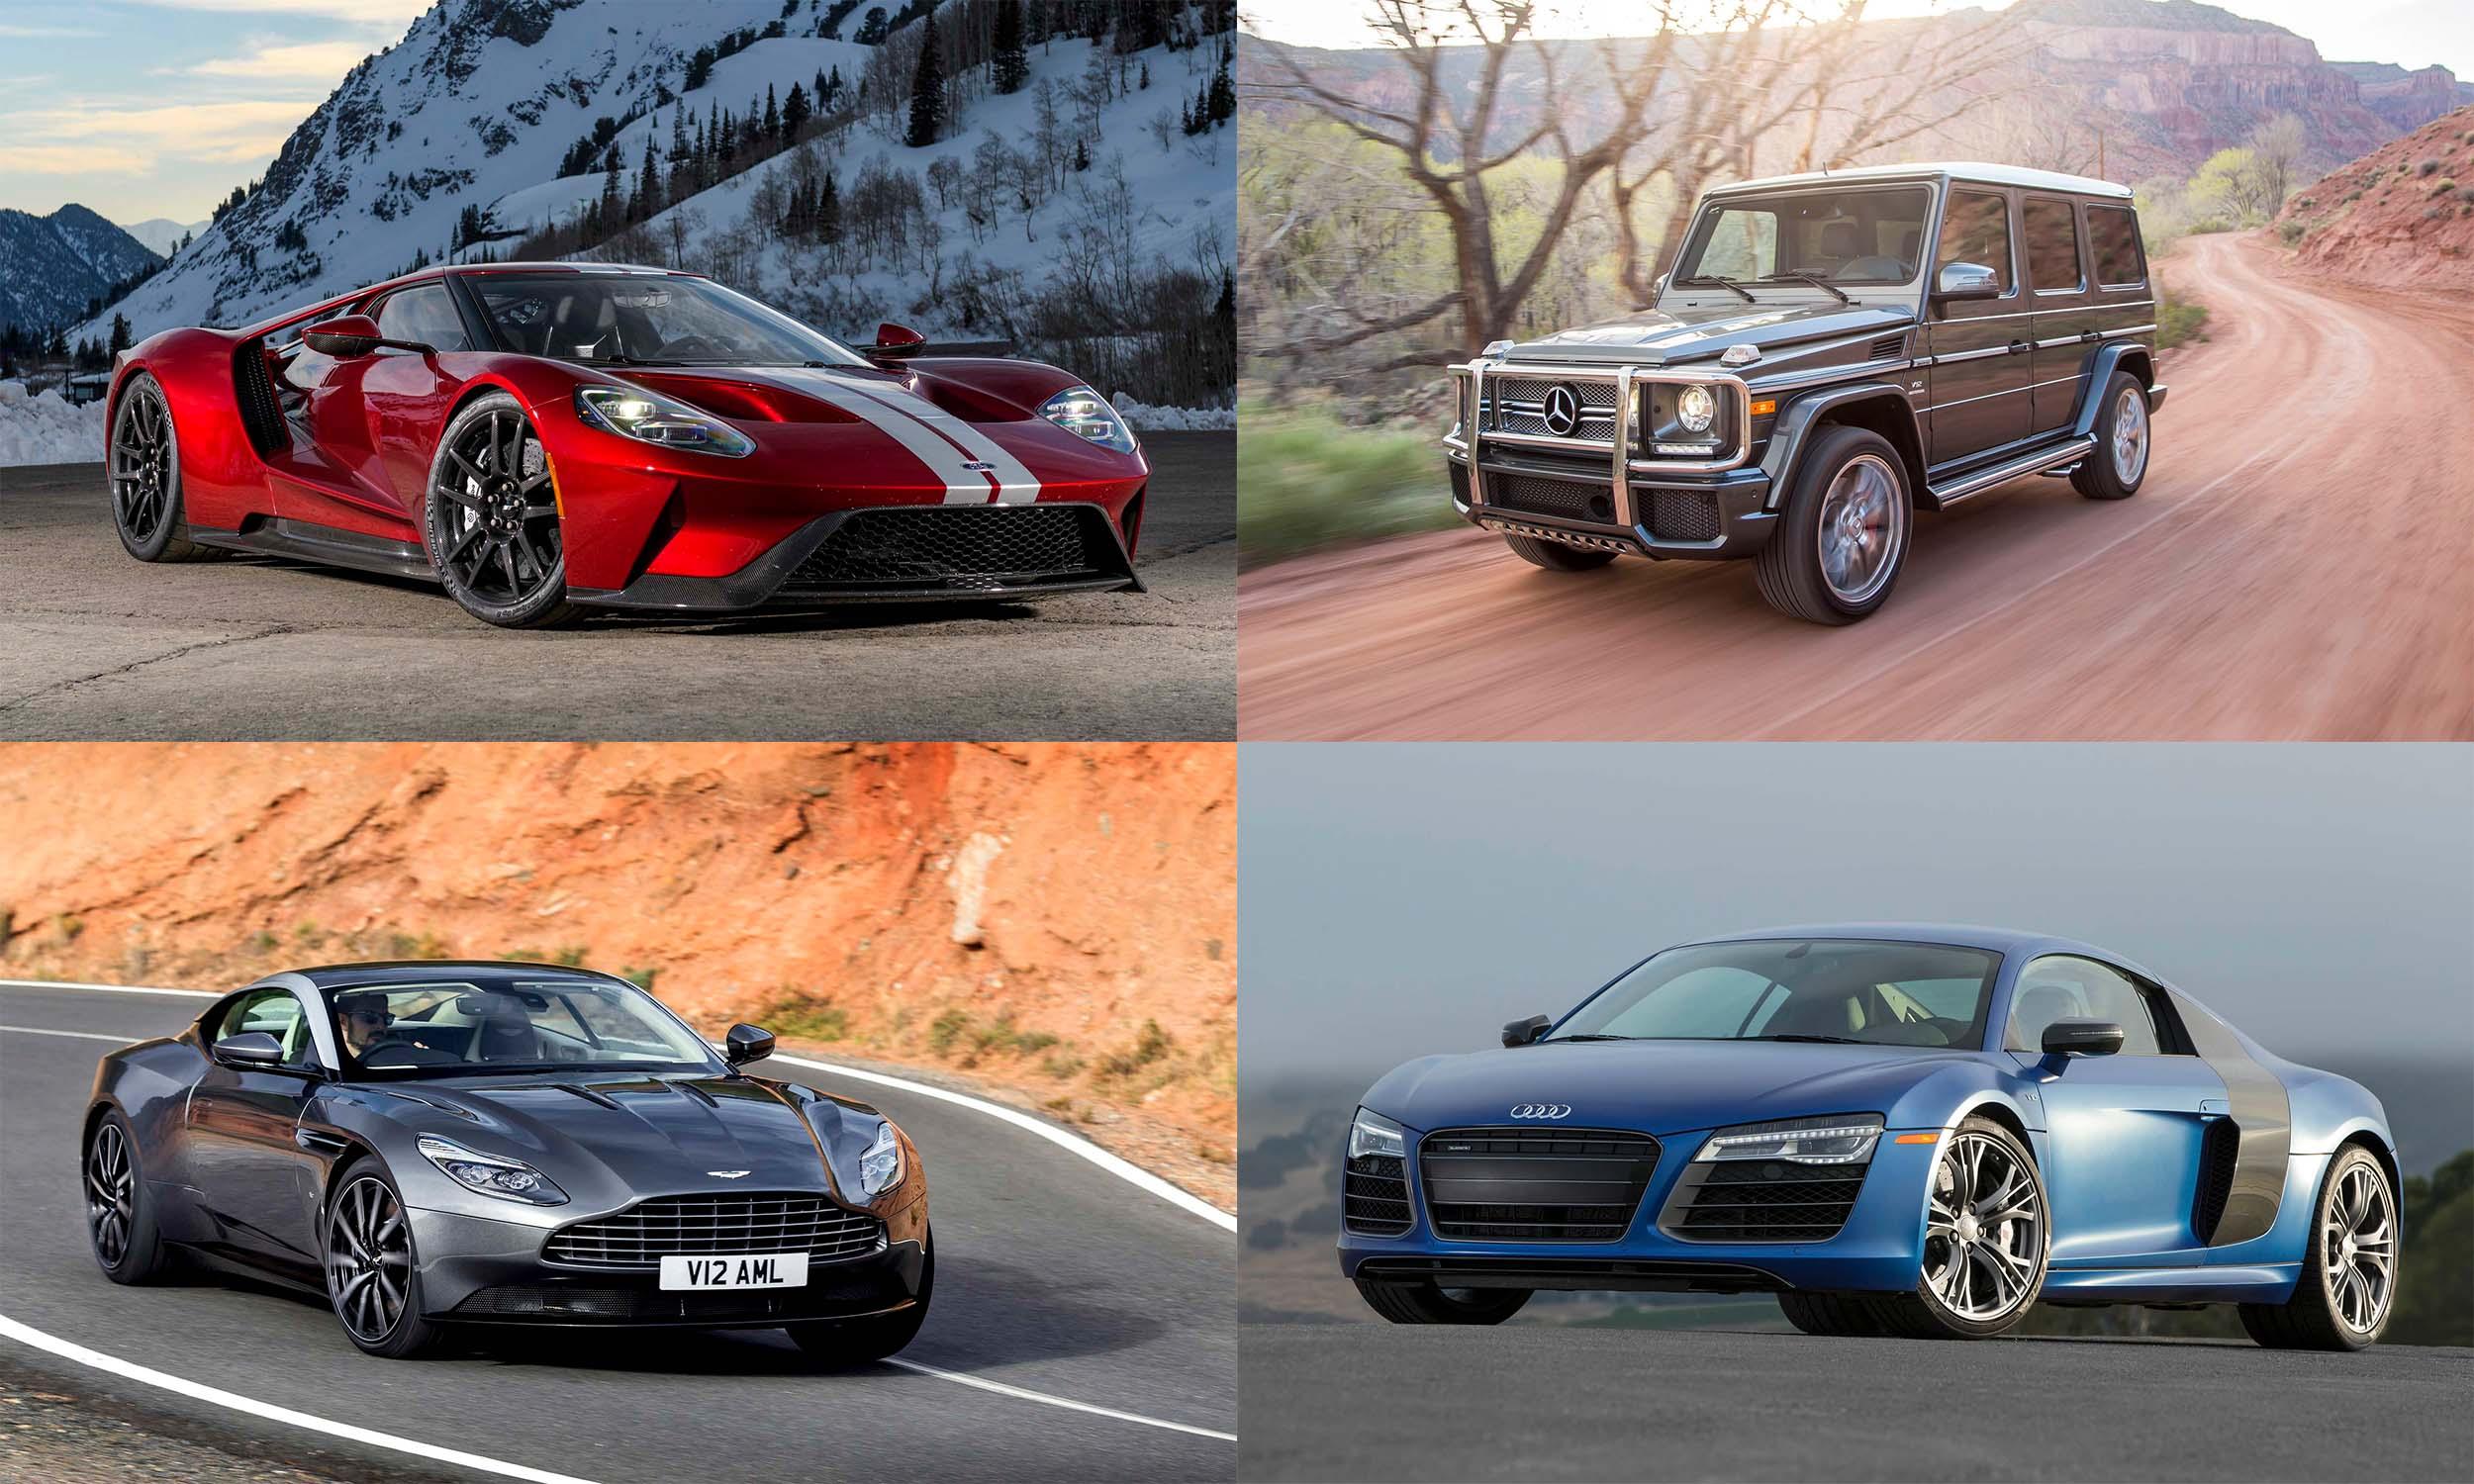 © Ford Motor Company, © Aston Martin Lagonda, © Mercedes-Benz USA, © Audi of America